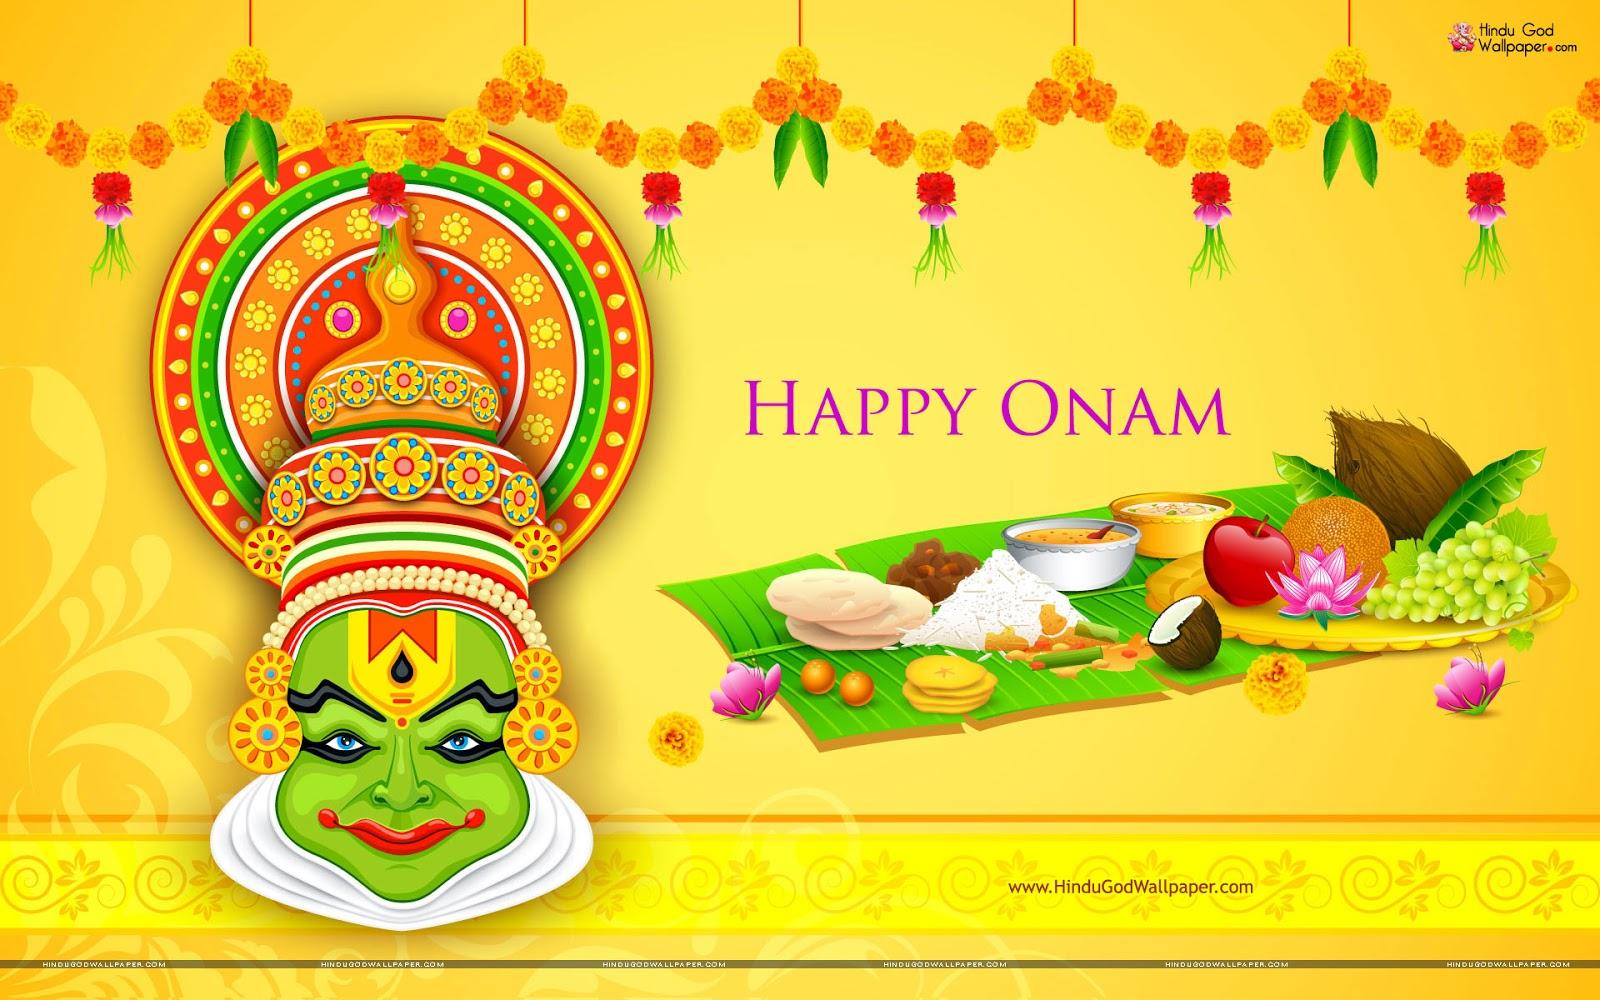 write about onam festival in malayalam